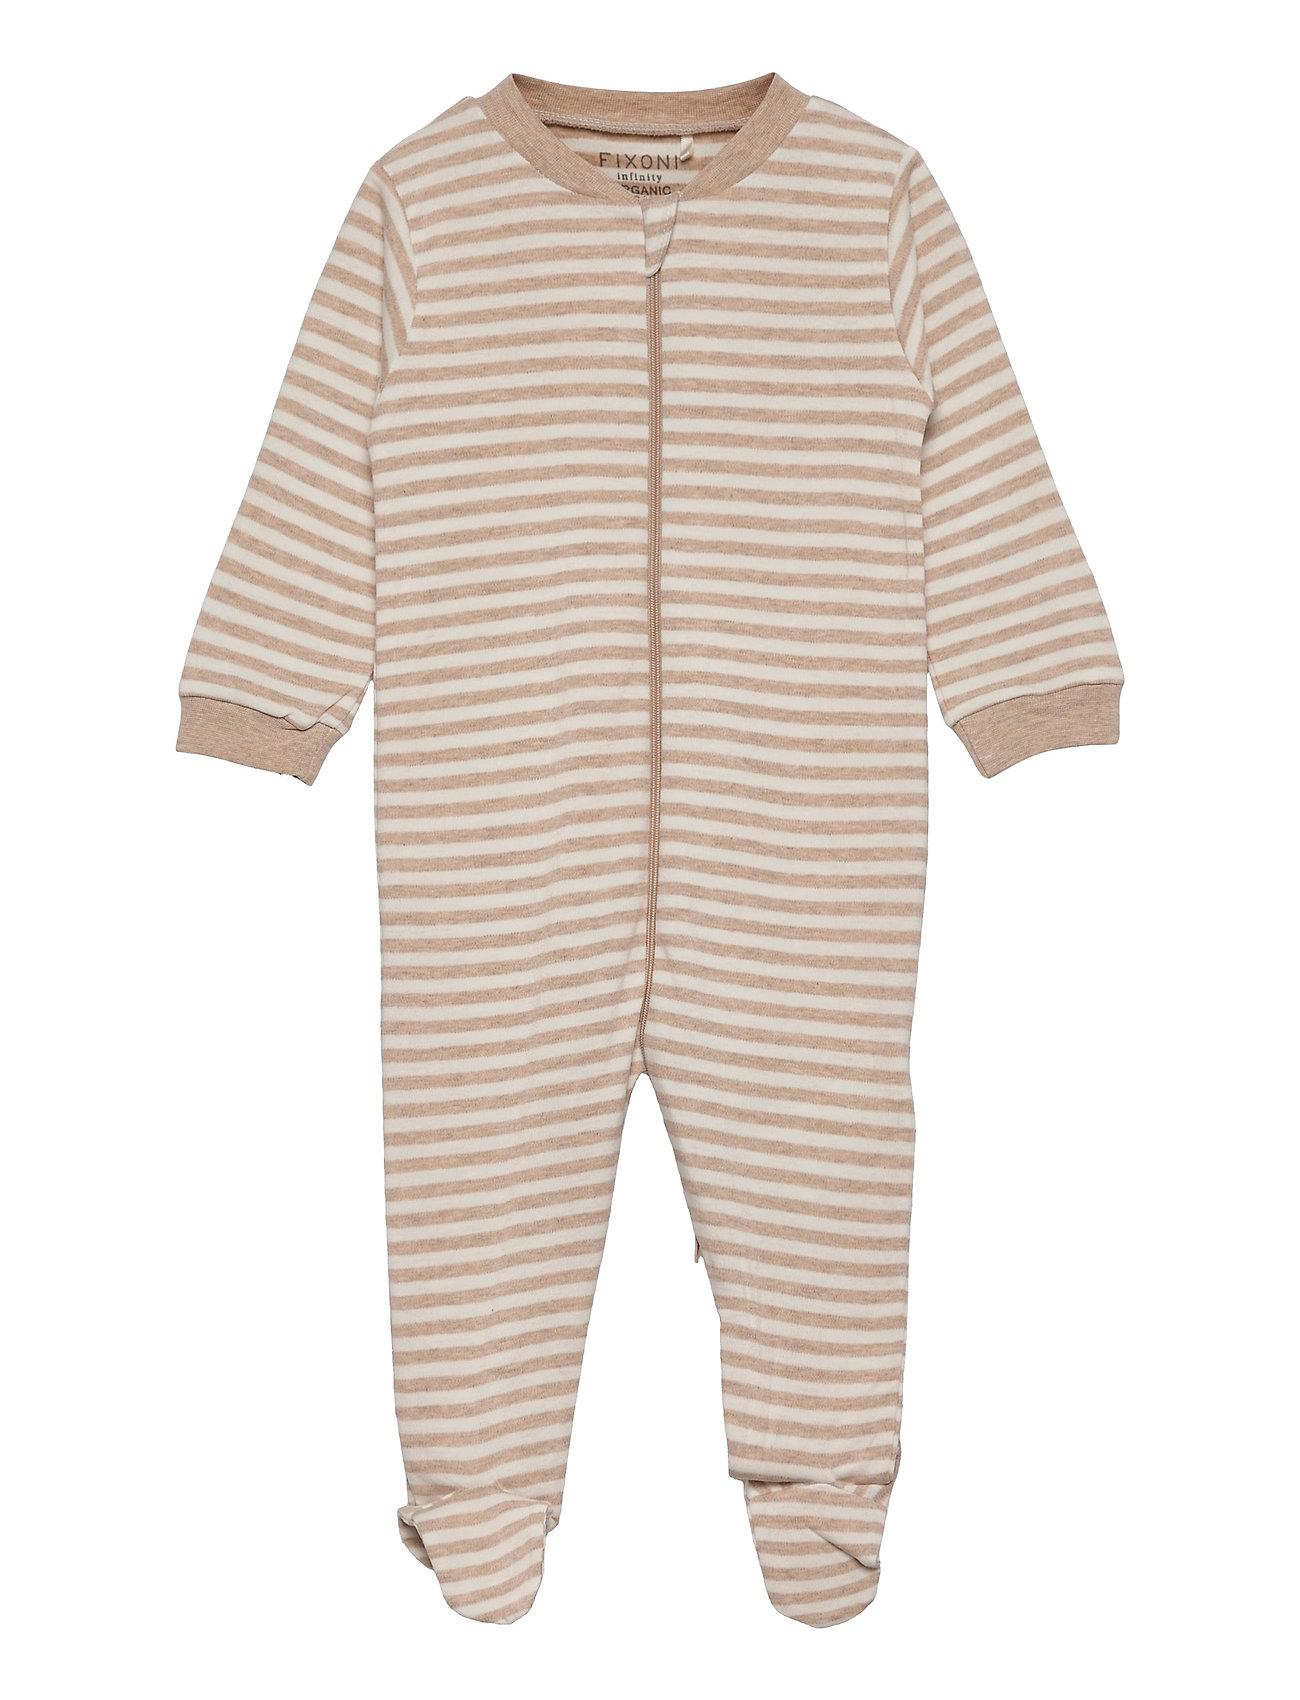 Nightsuit W.Zipper & Foot Pyjamas Sie Jumpsuit Beige Fixoni